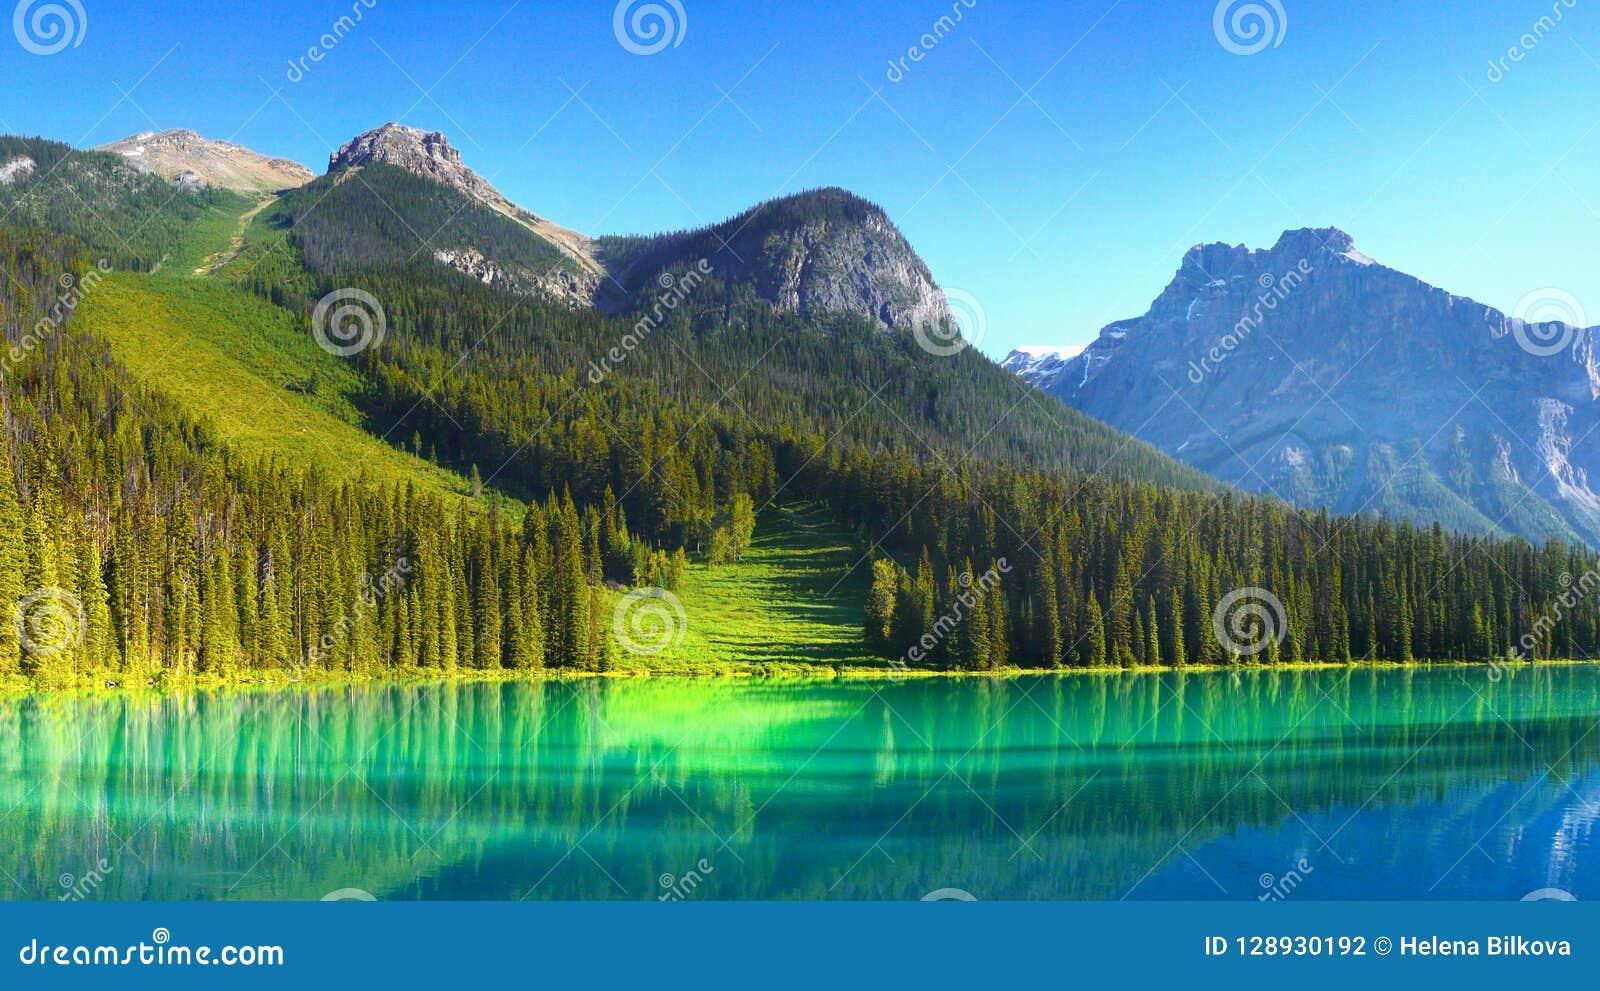 Canadian Rockies and Lake, Sunrise Scenery